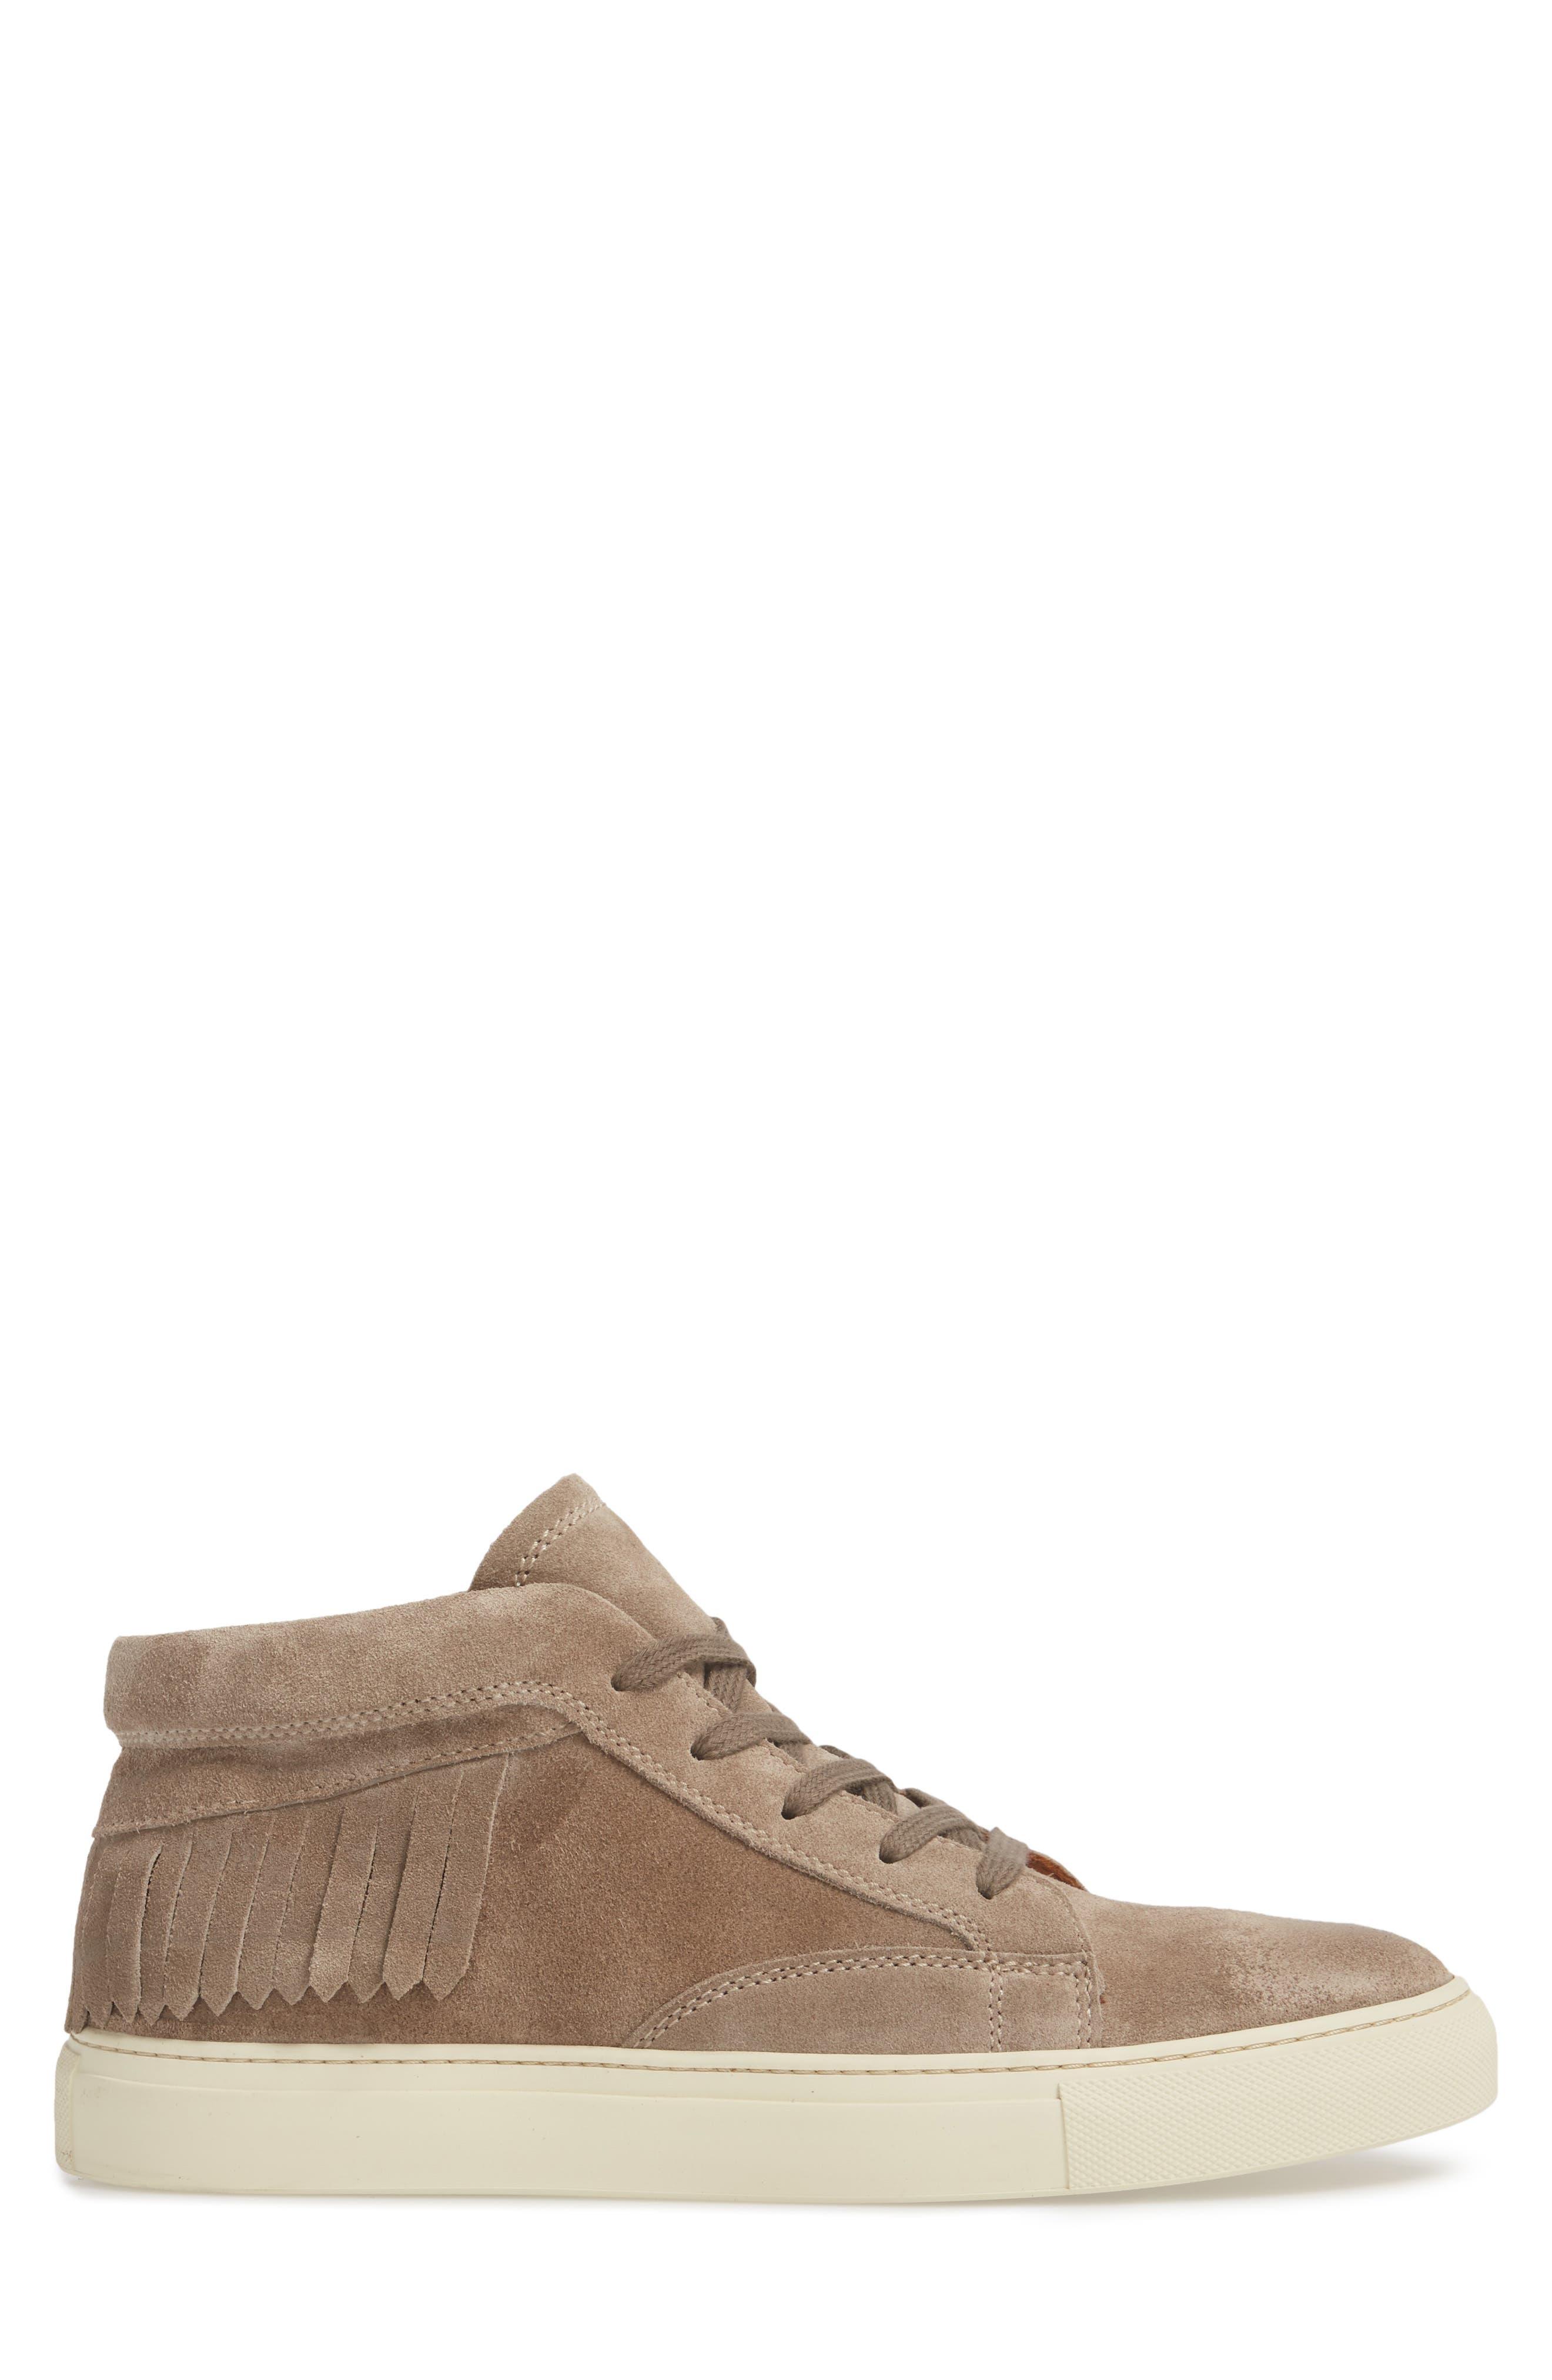 John Varvatos Reed Fringe Sneaker,                             Alternate thumbnail 3, color,                             Rye Suede